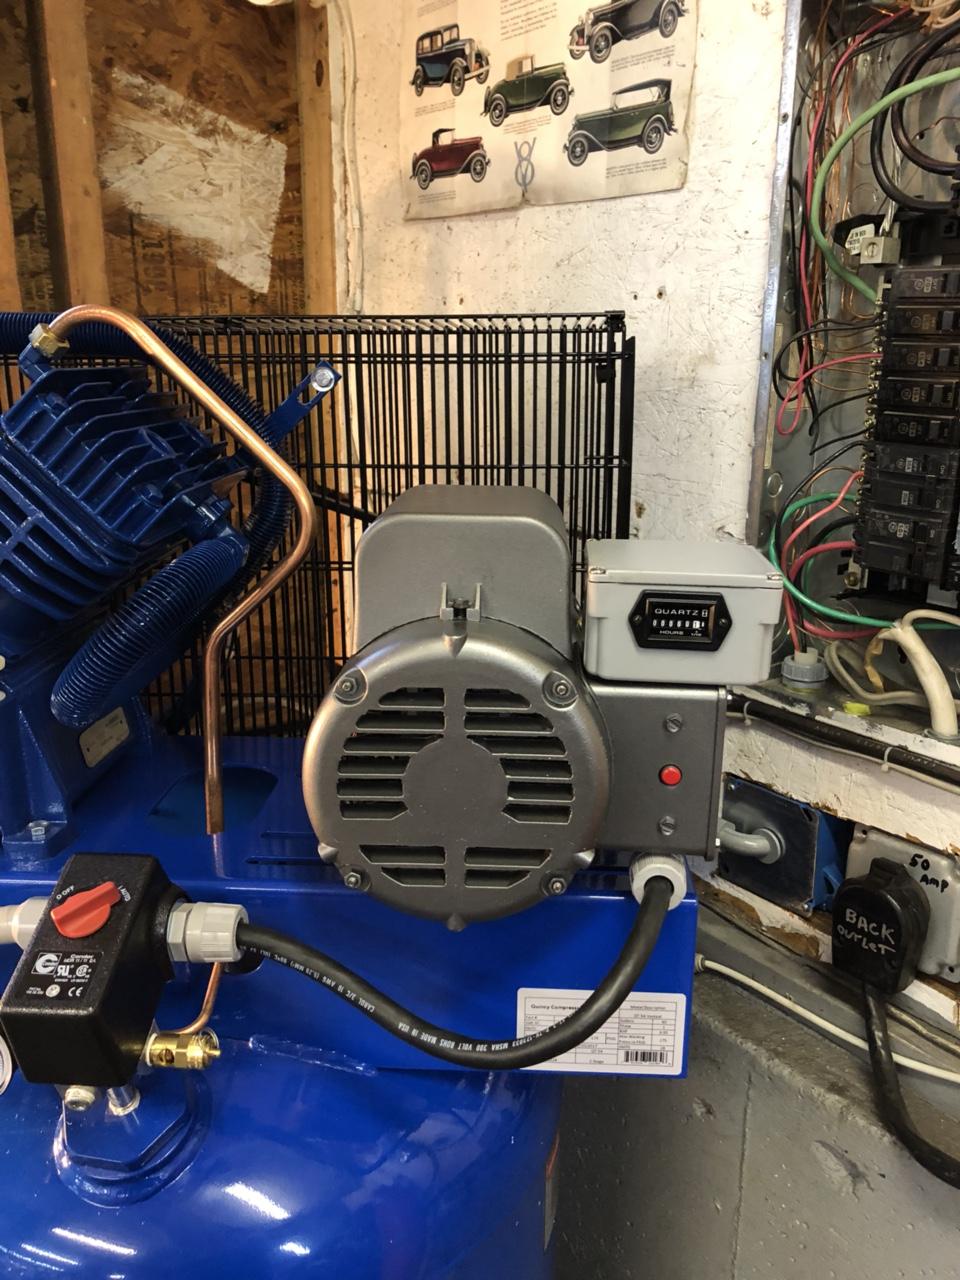 download quincy compressor wiring diagram epanel digital air compressor starter wiring diagram wrg 4272] metabo wiring diagram